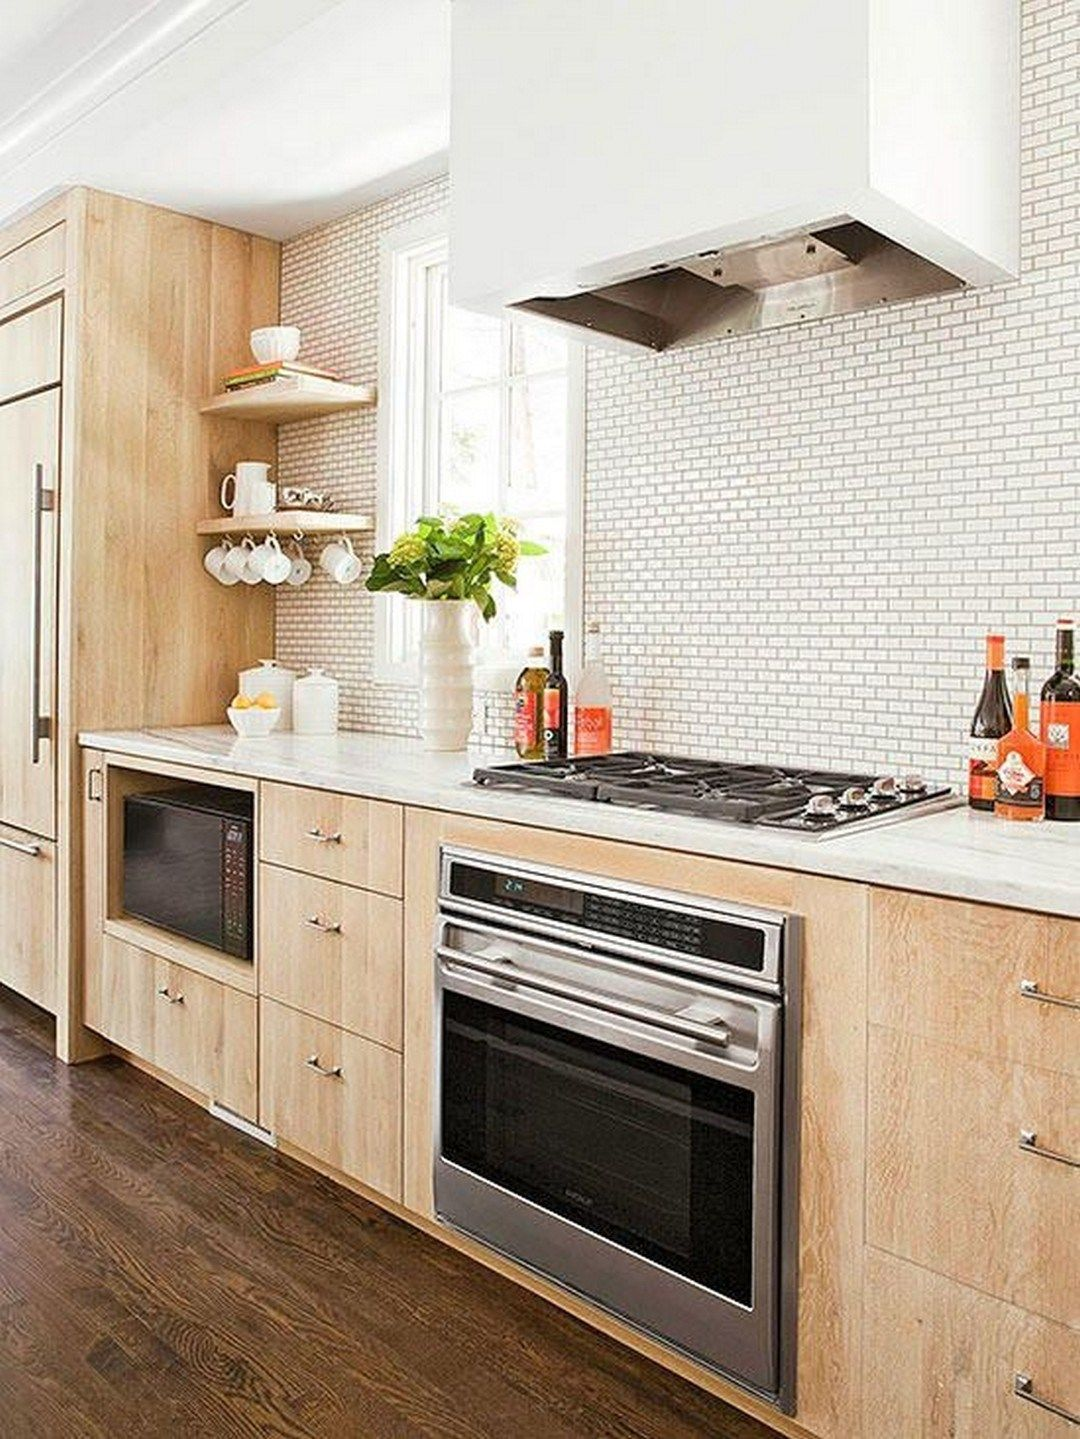 29 Fantastic Kitchen Backsplash Ideas With Oak Cabinets (5 ... on Modern Kitchen Backsplash With Maple Cabinets  id=83798